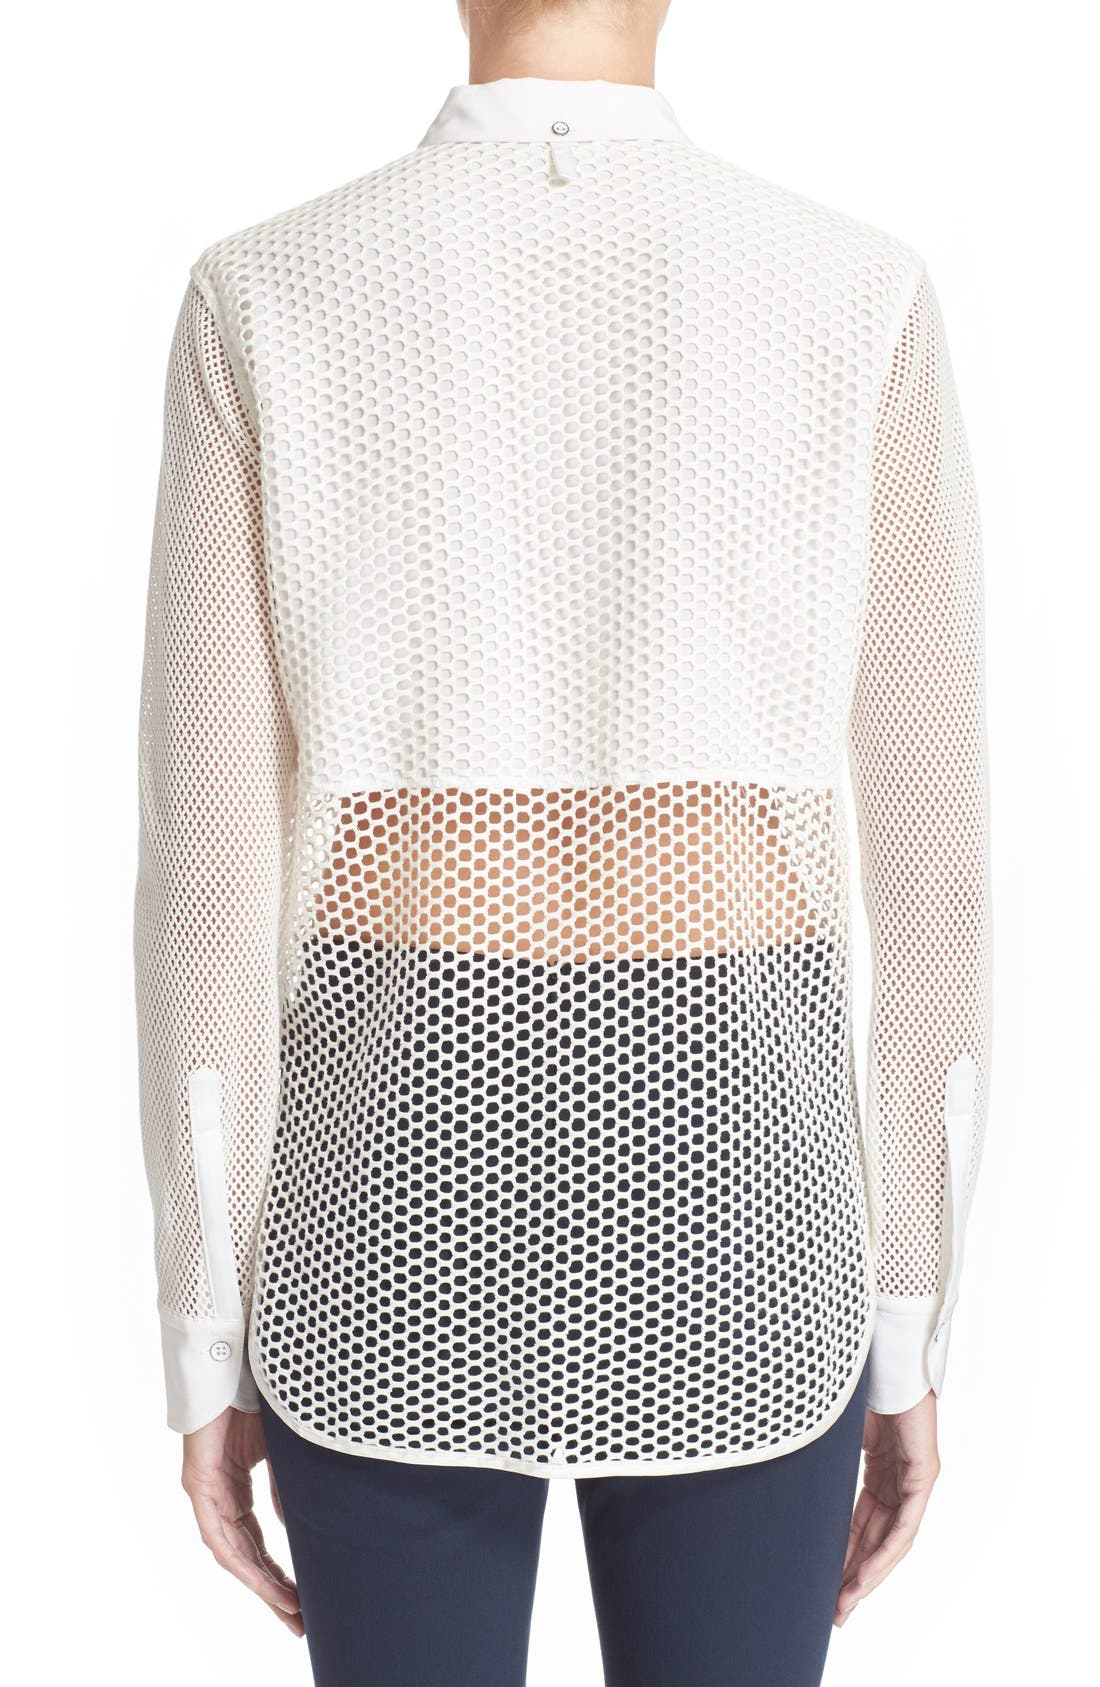 Alternate Image 2  - rag & bone 'Luna' Stretch Cotton Mesh Shirt